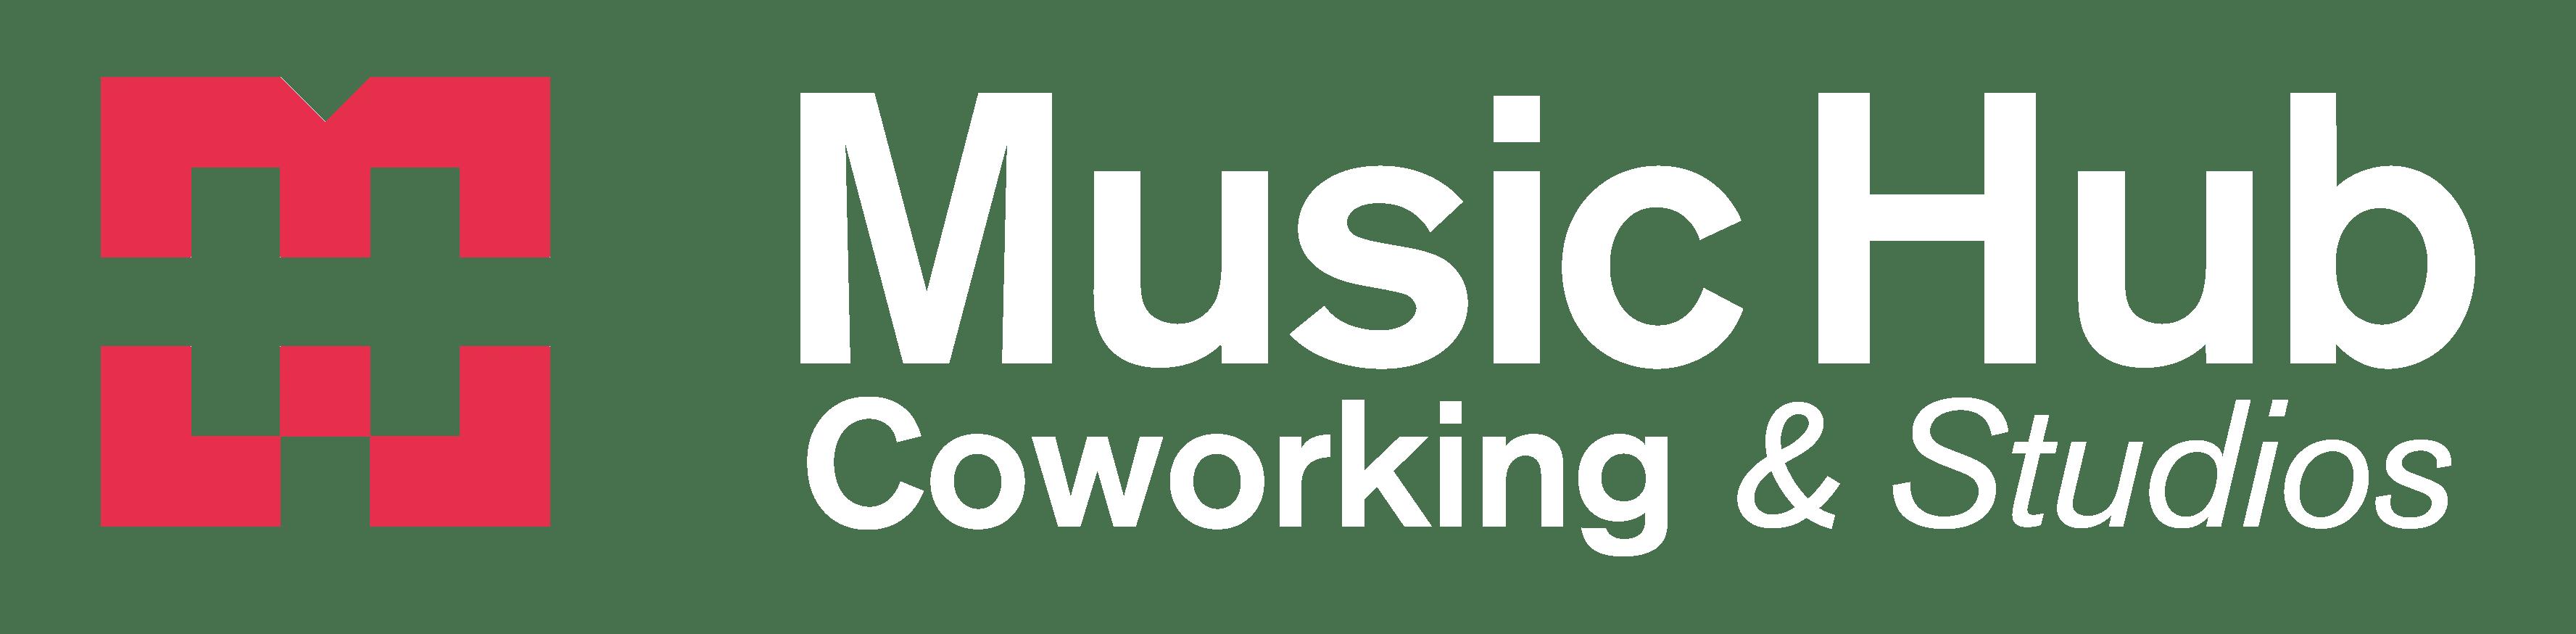 Logo de Music Hub